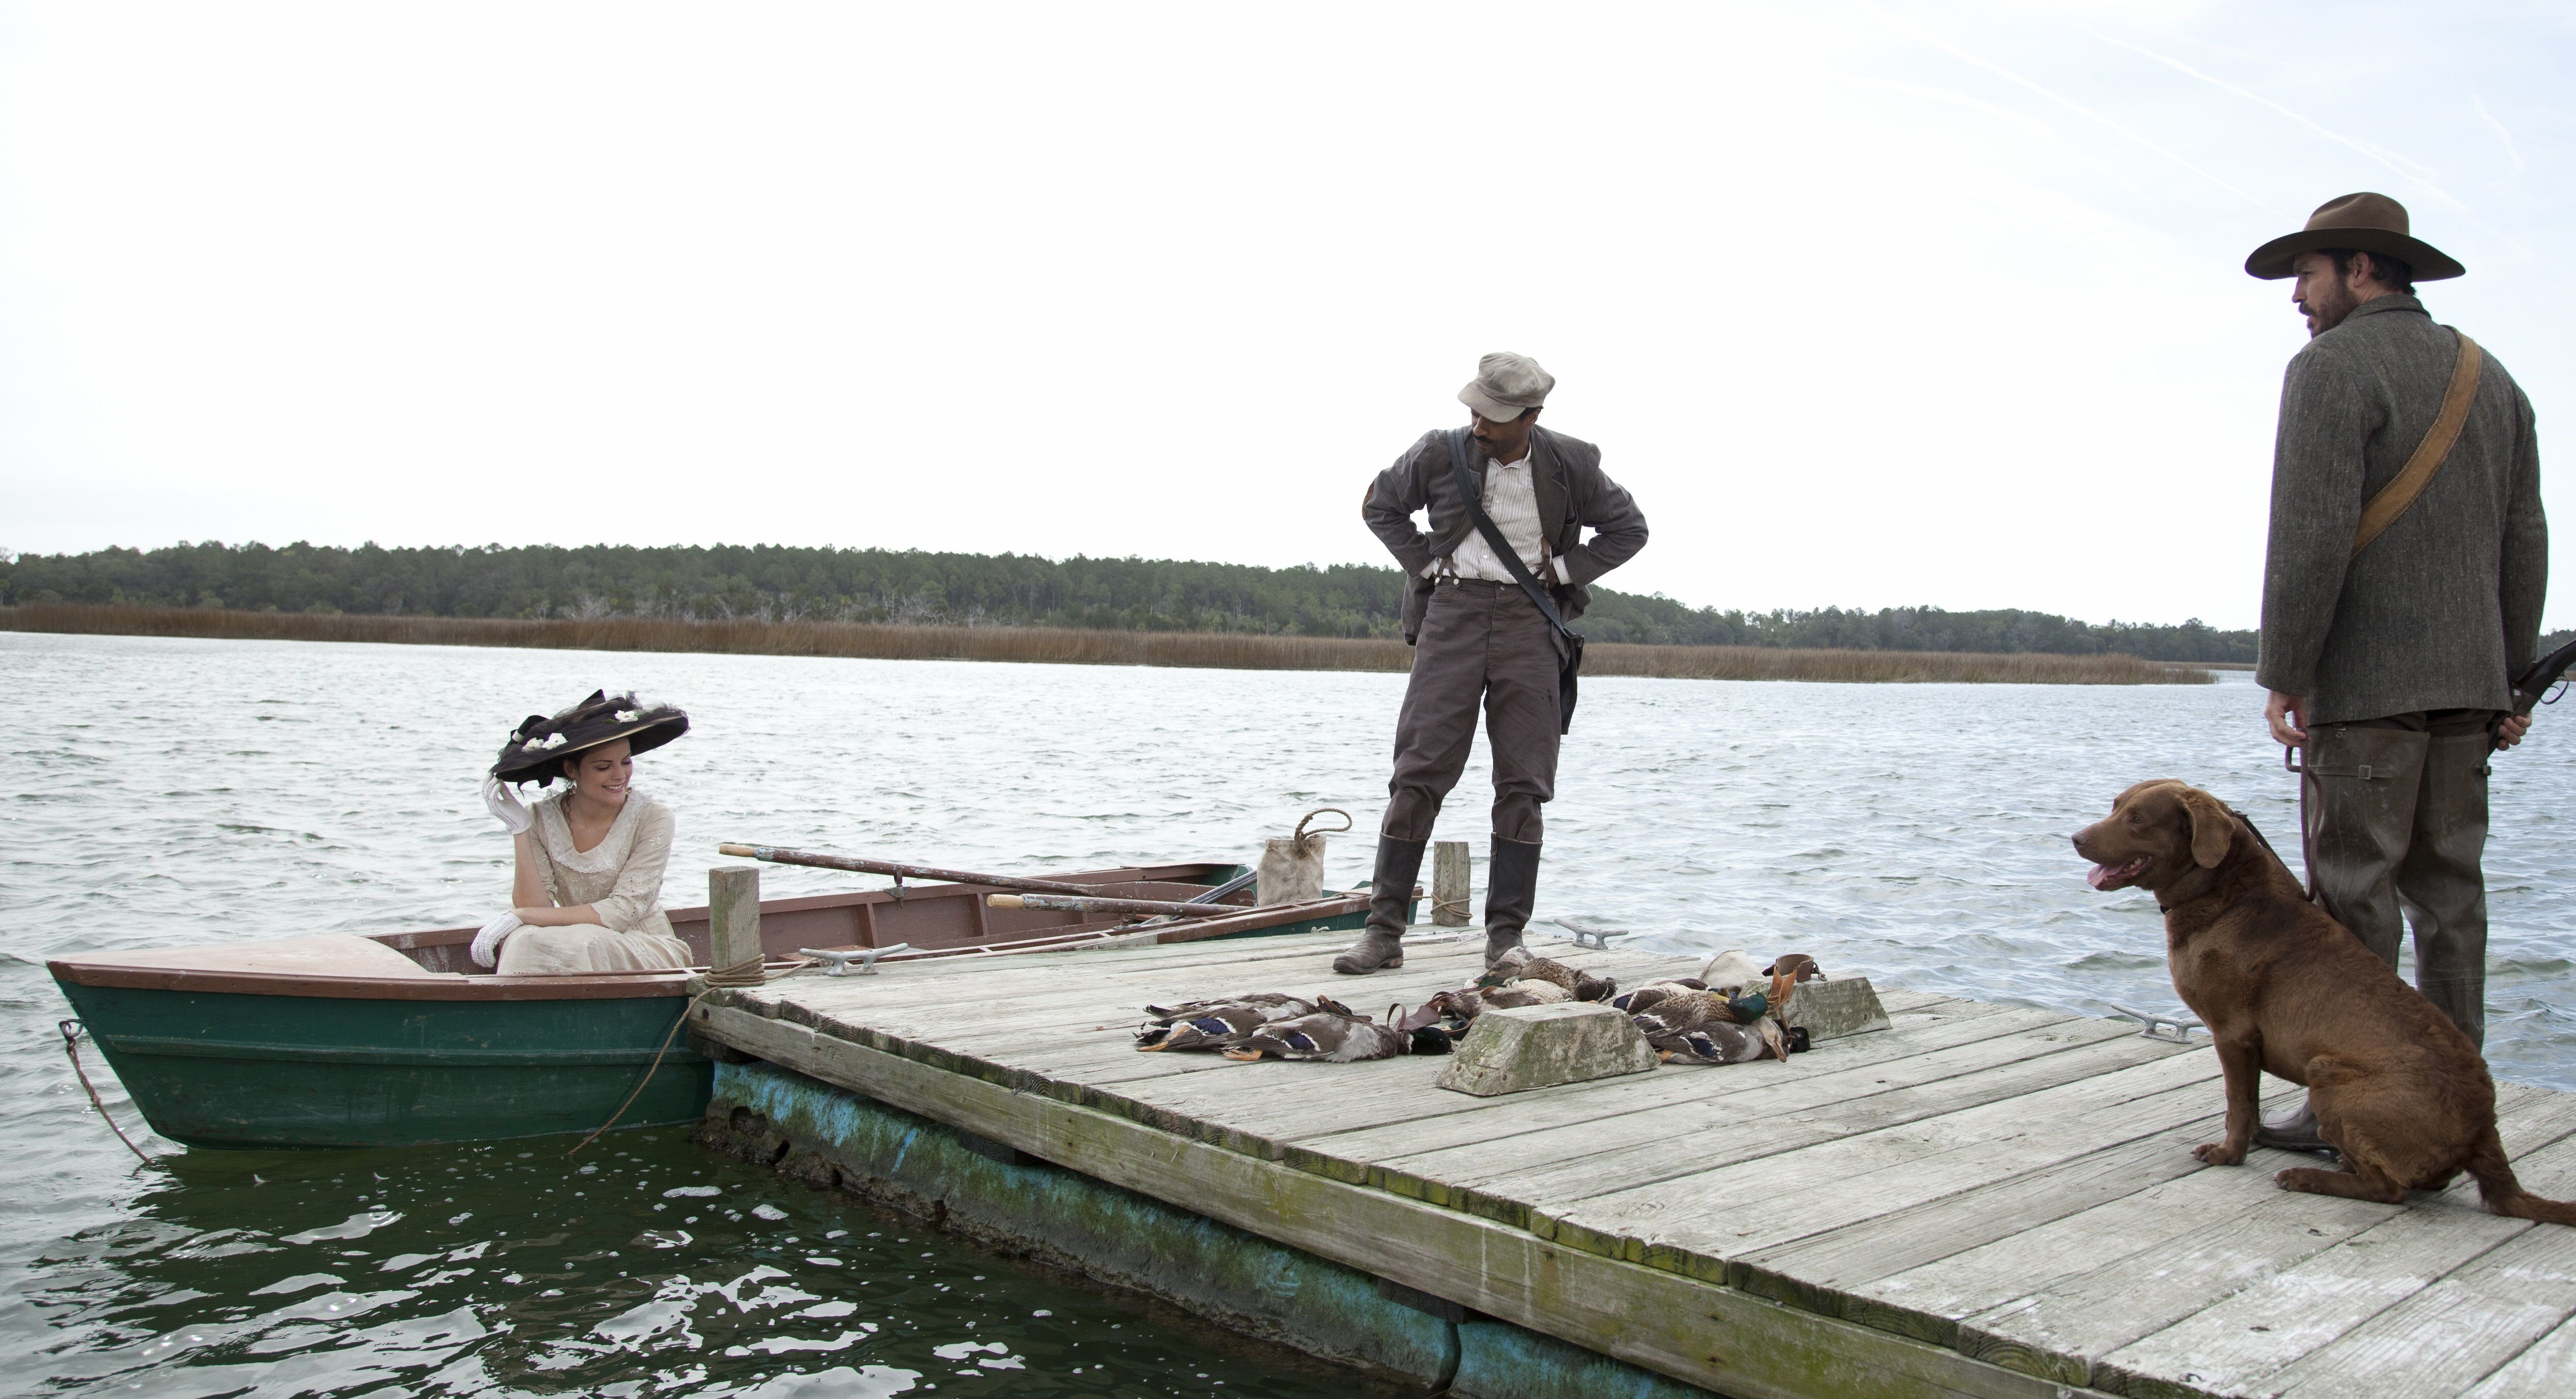 An image from Savannah